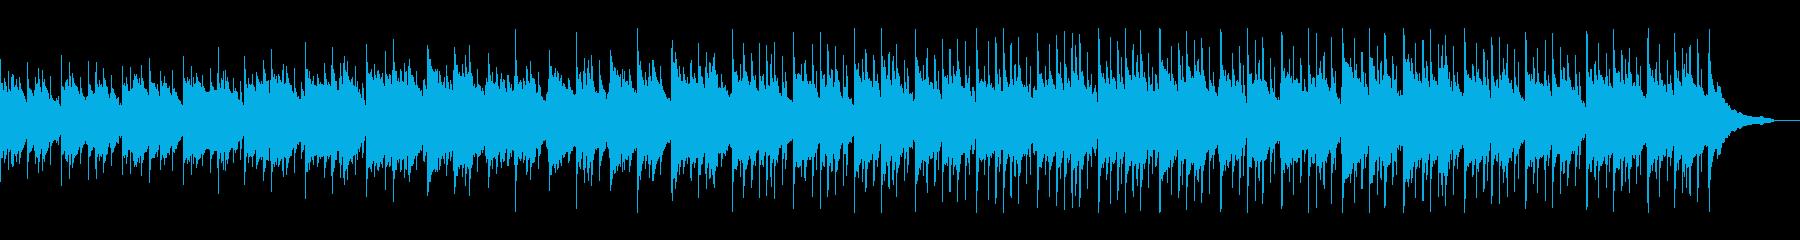 Background Guitarの再生済みの波形